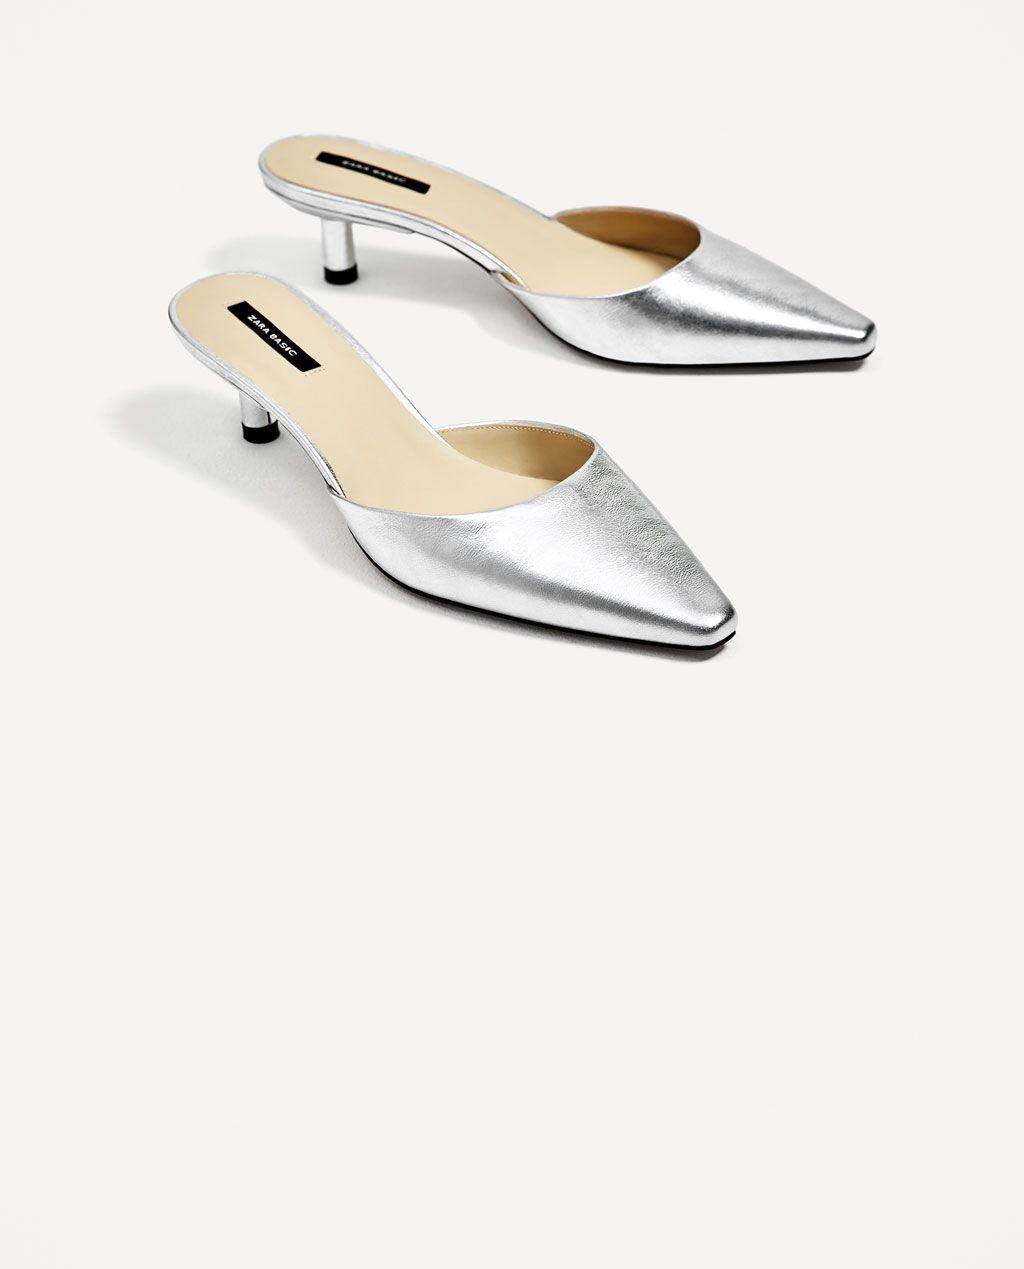 CHAUSSURES OCCASION TOUTE LA FRANCE Chaussures Femme